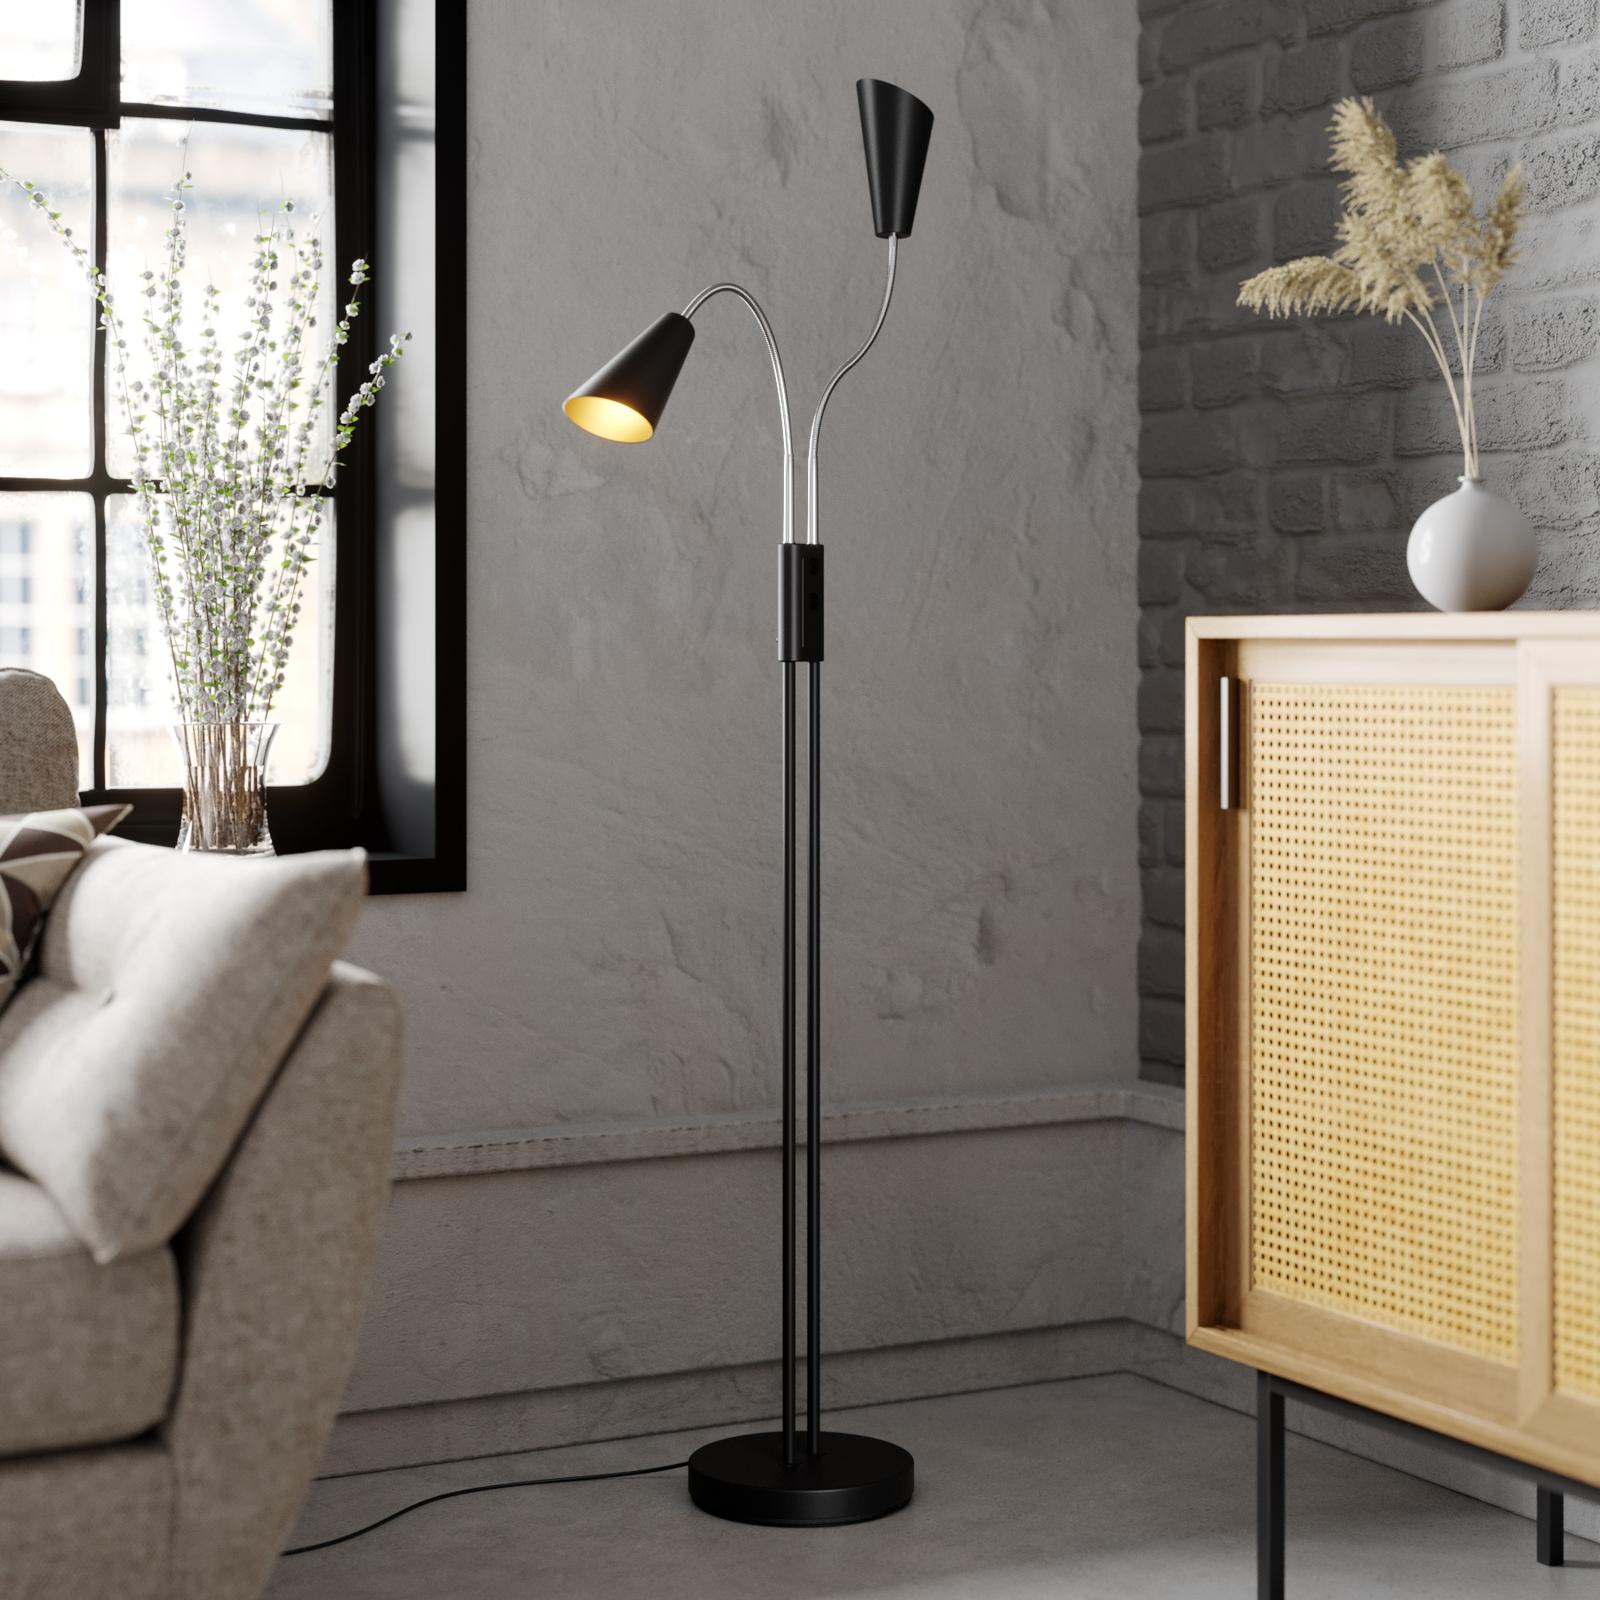 Lucande Medira gulvlampe, 2 lyskilder, svart